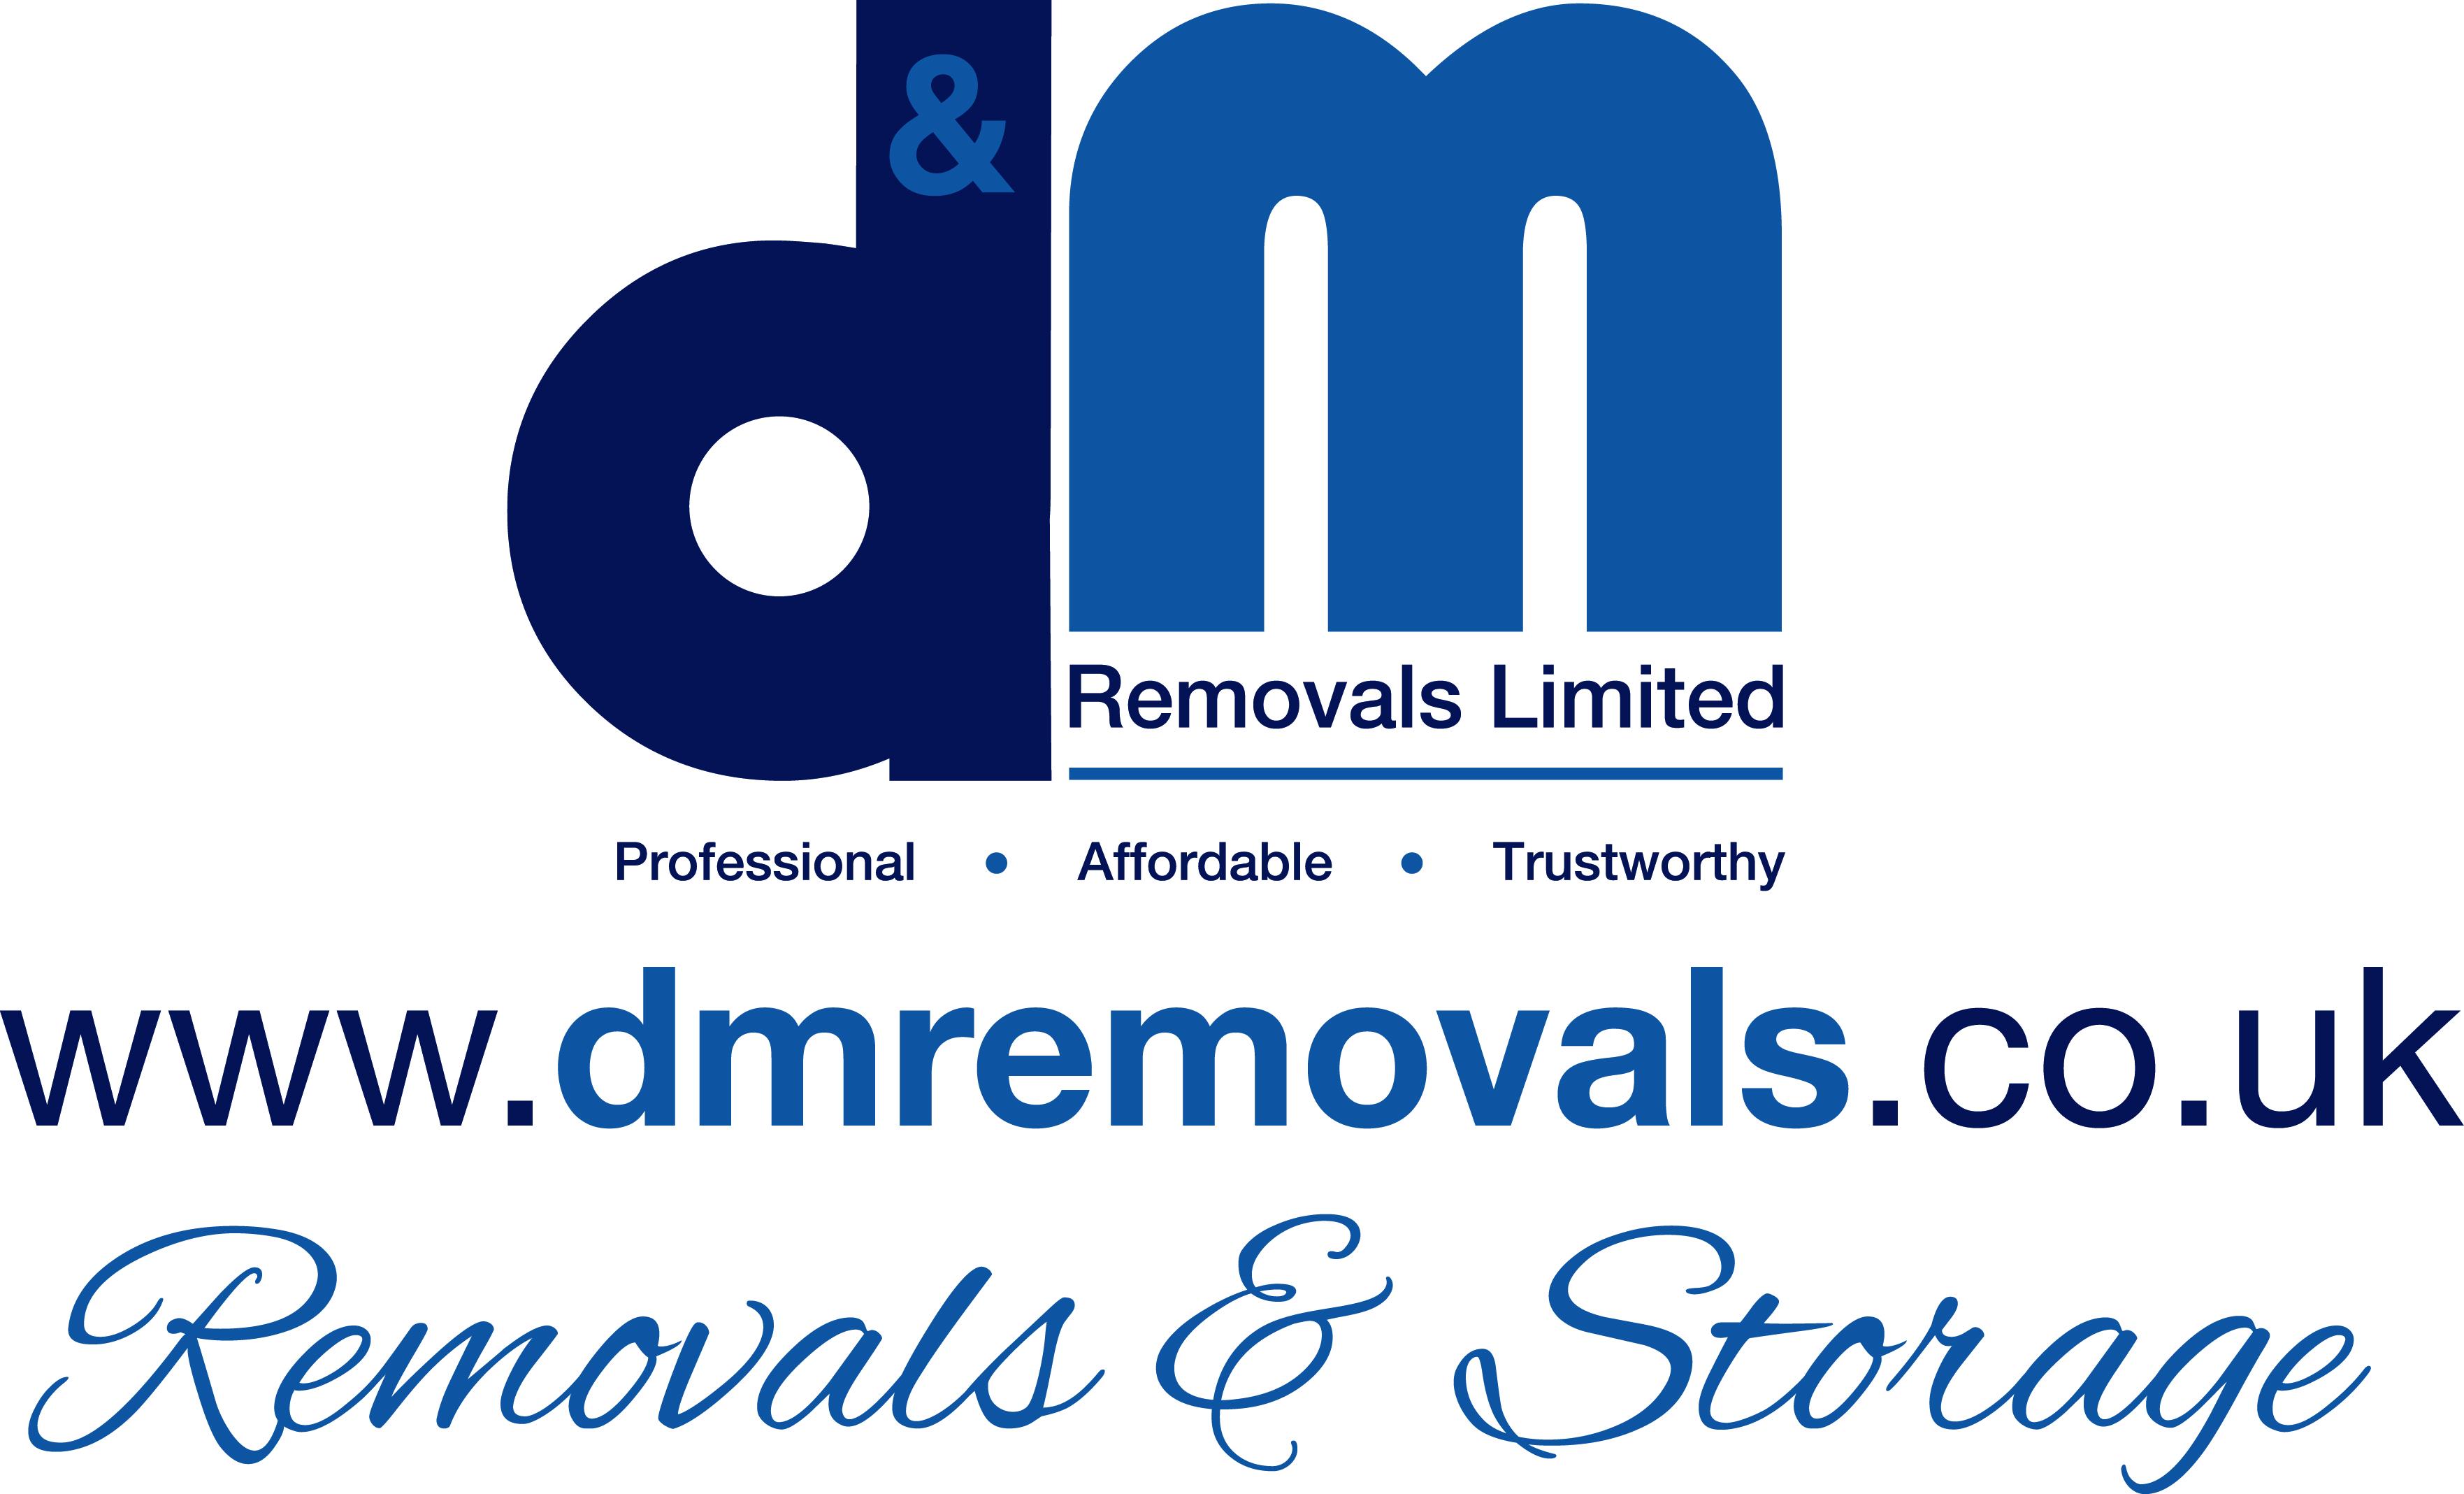 D&M Removals & Storage